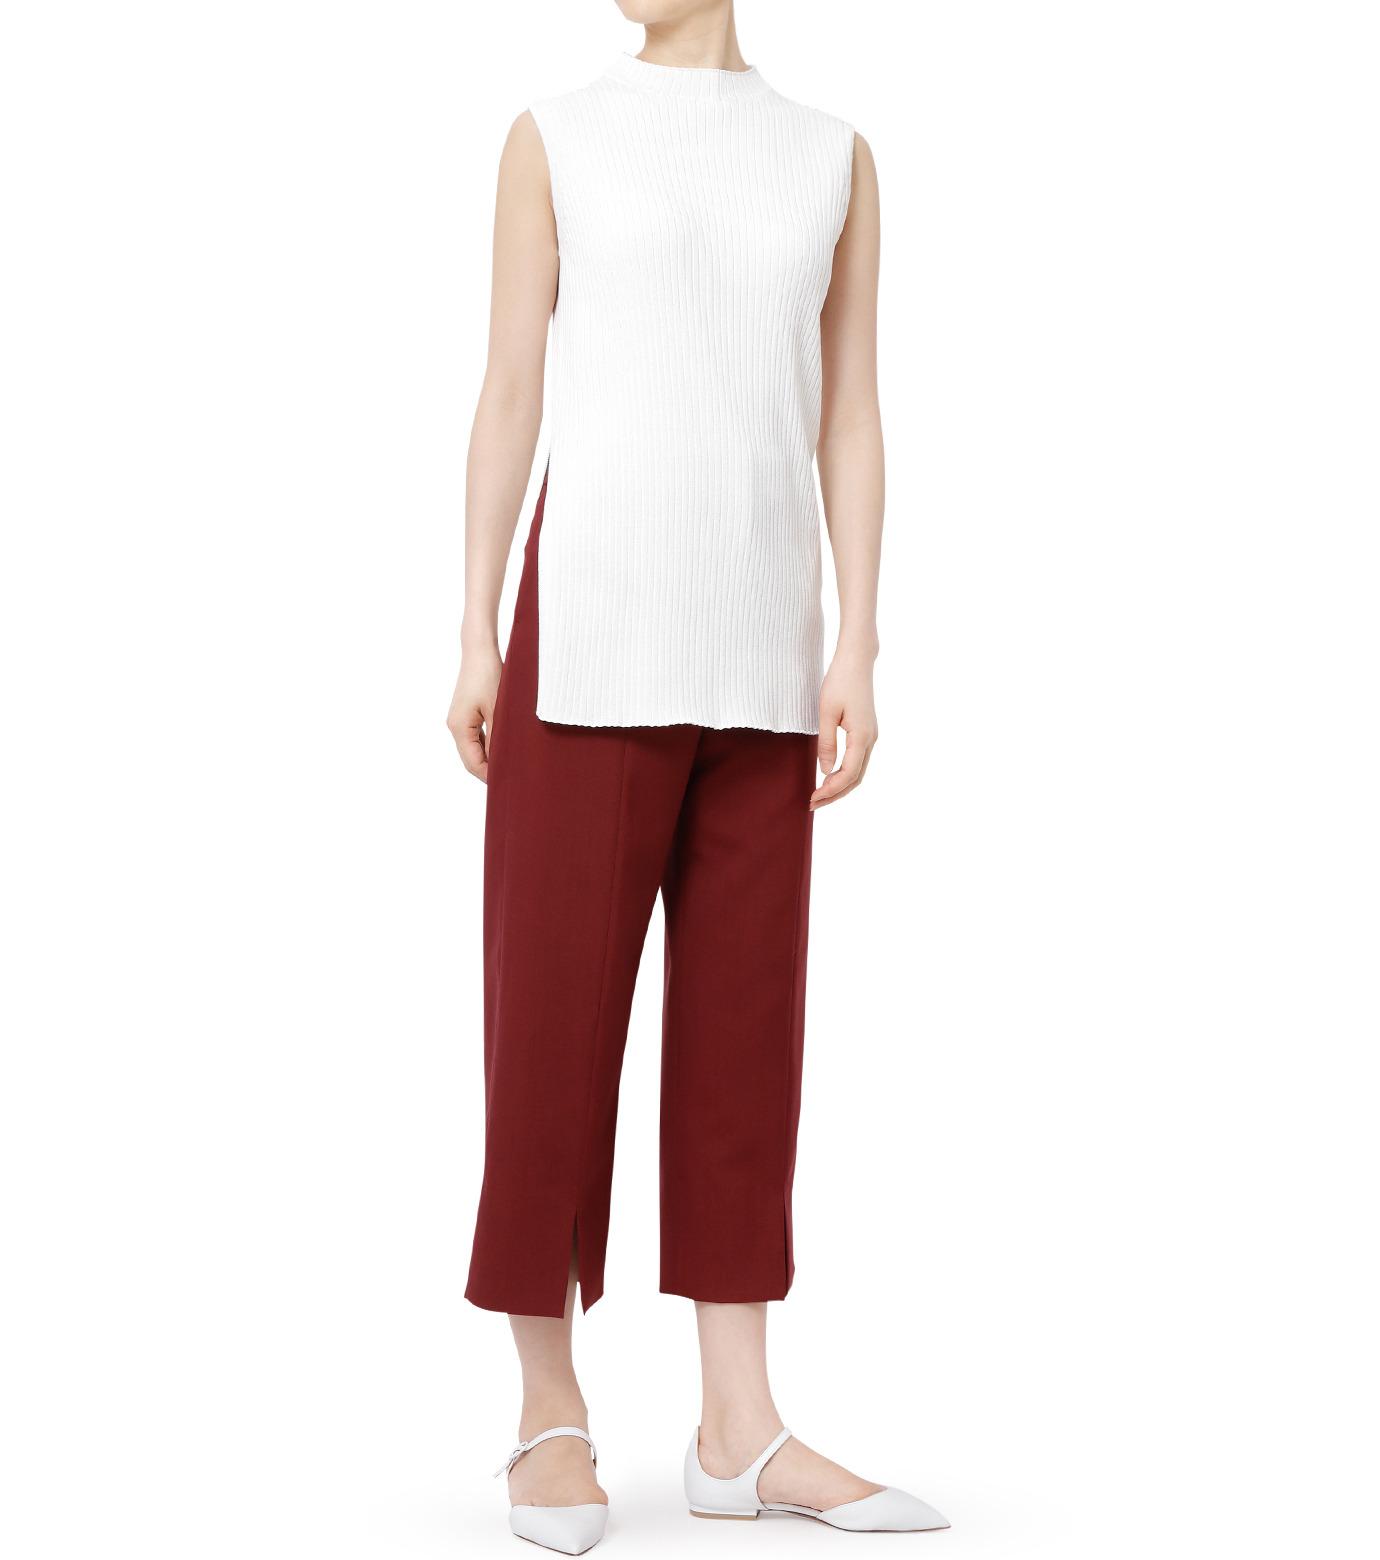 LE CIEL BLEU(ルシェルブルー)のサマーウールストレートパンツ-BORDEAUX(パンツ/pants)-18A68001 拡大詳細画像4